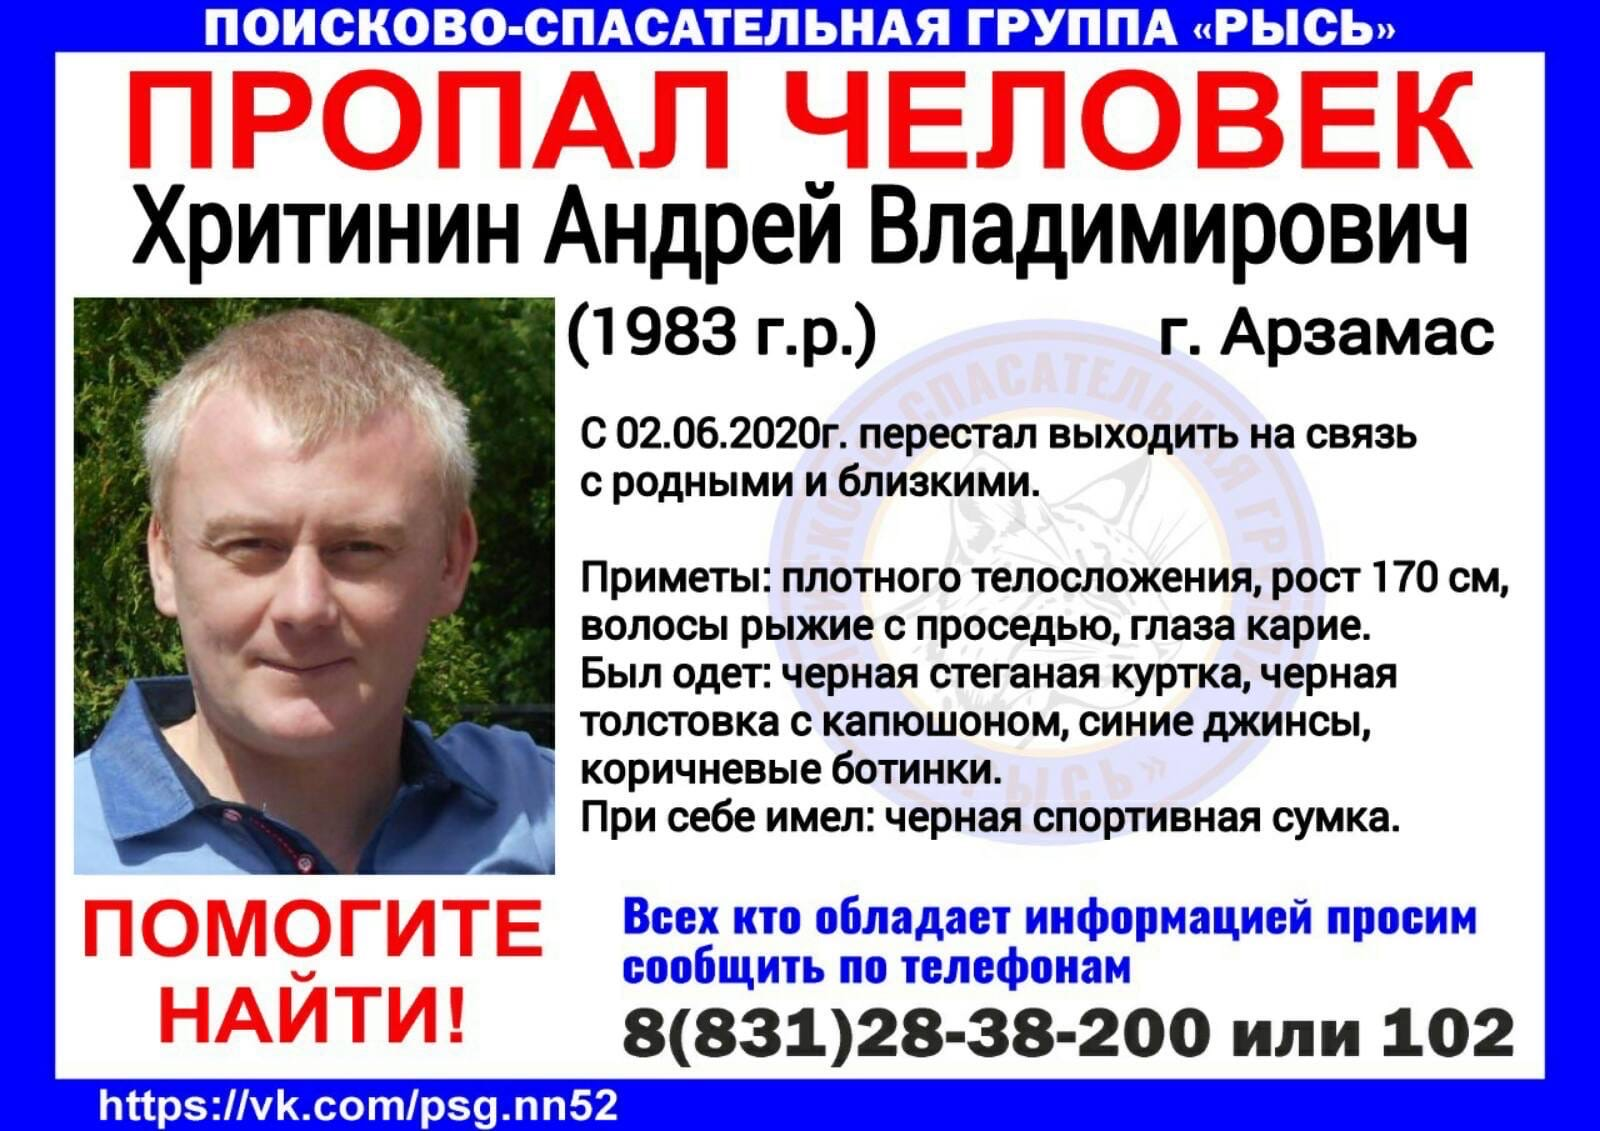 Хритинин Андрей Владимирович